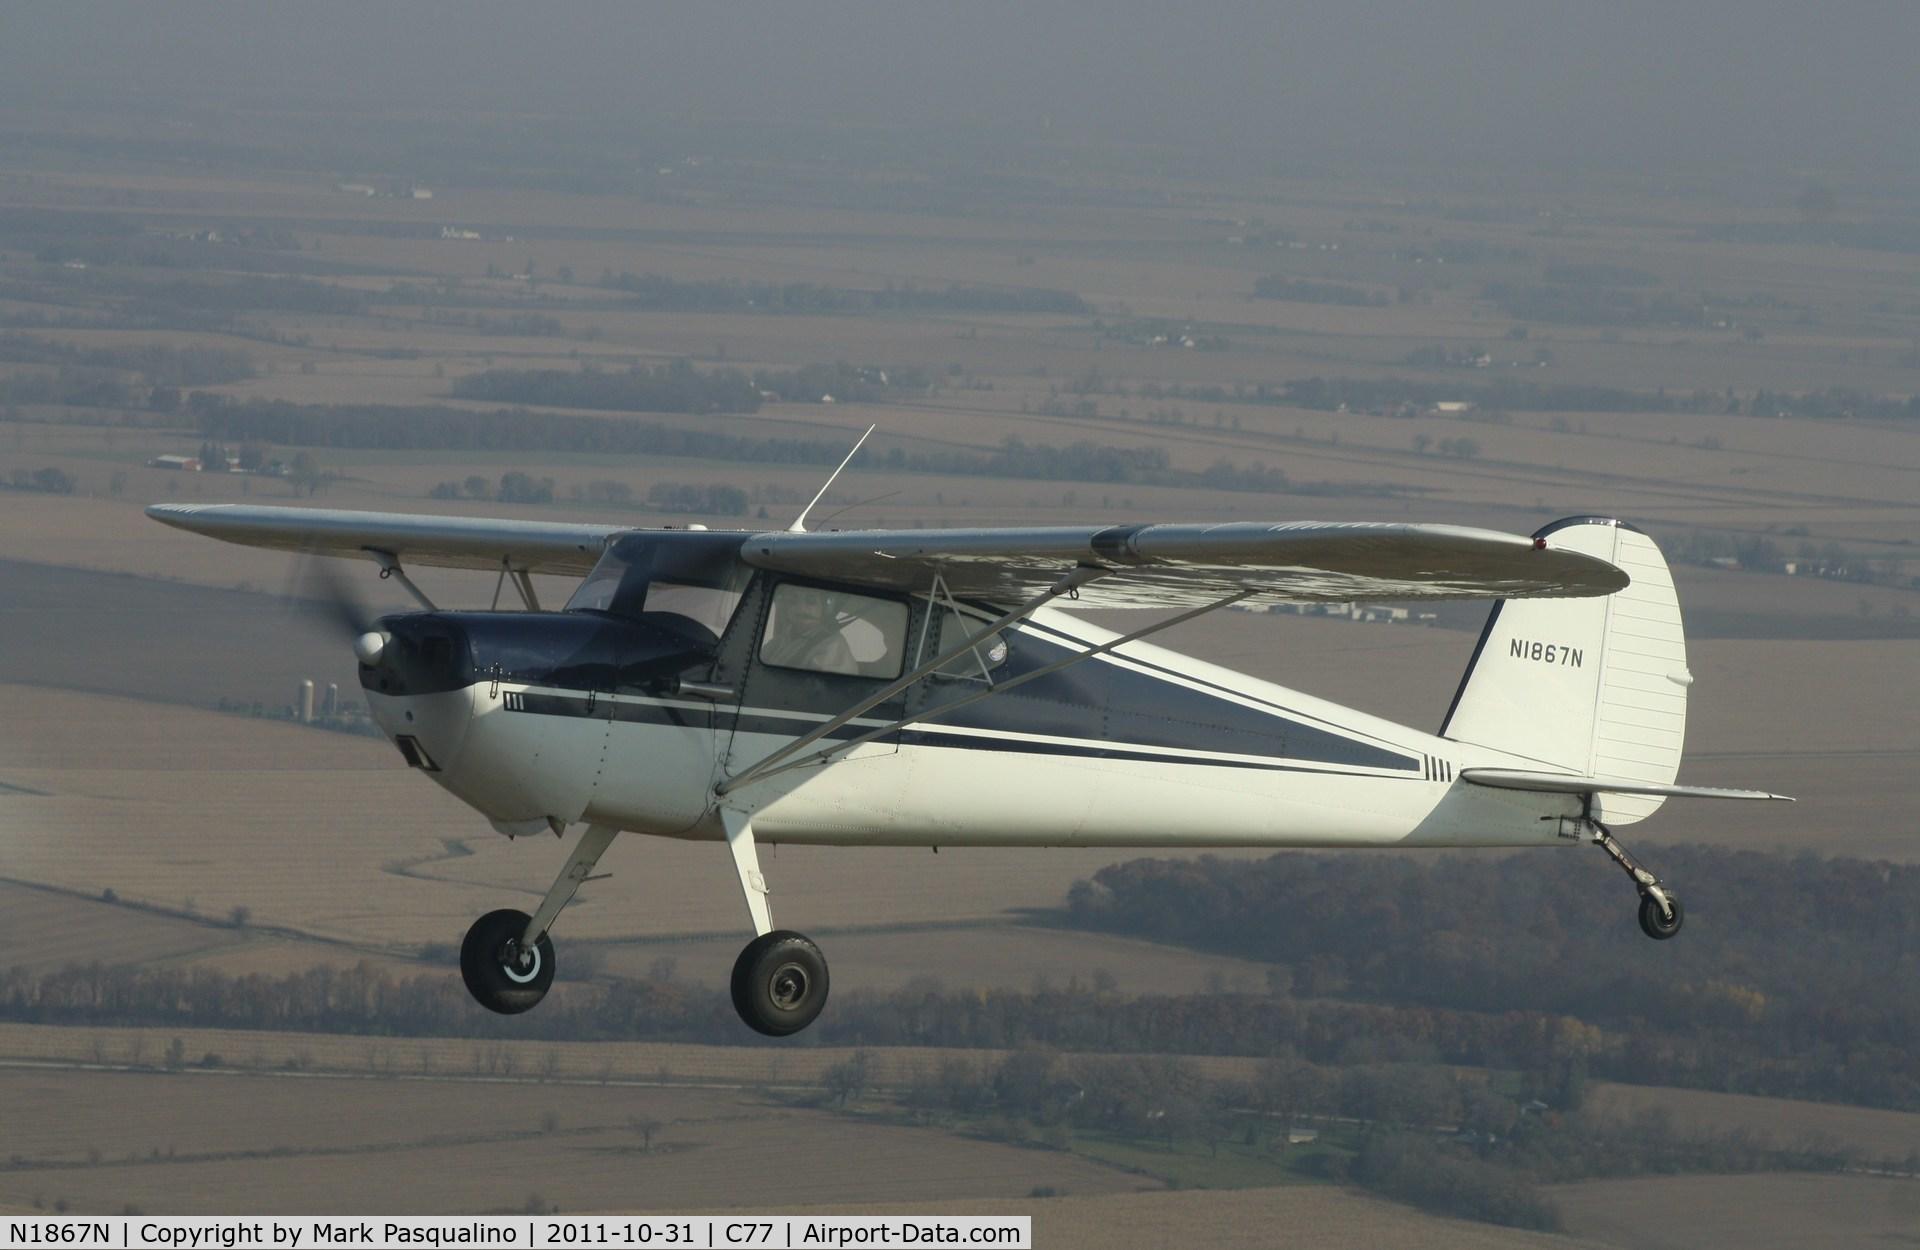 N1867N, 1946 Cessna 120 C/N 12111, Cessna 120